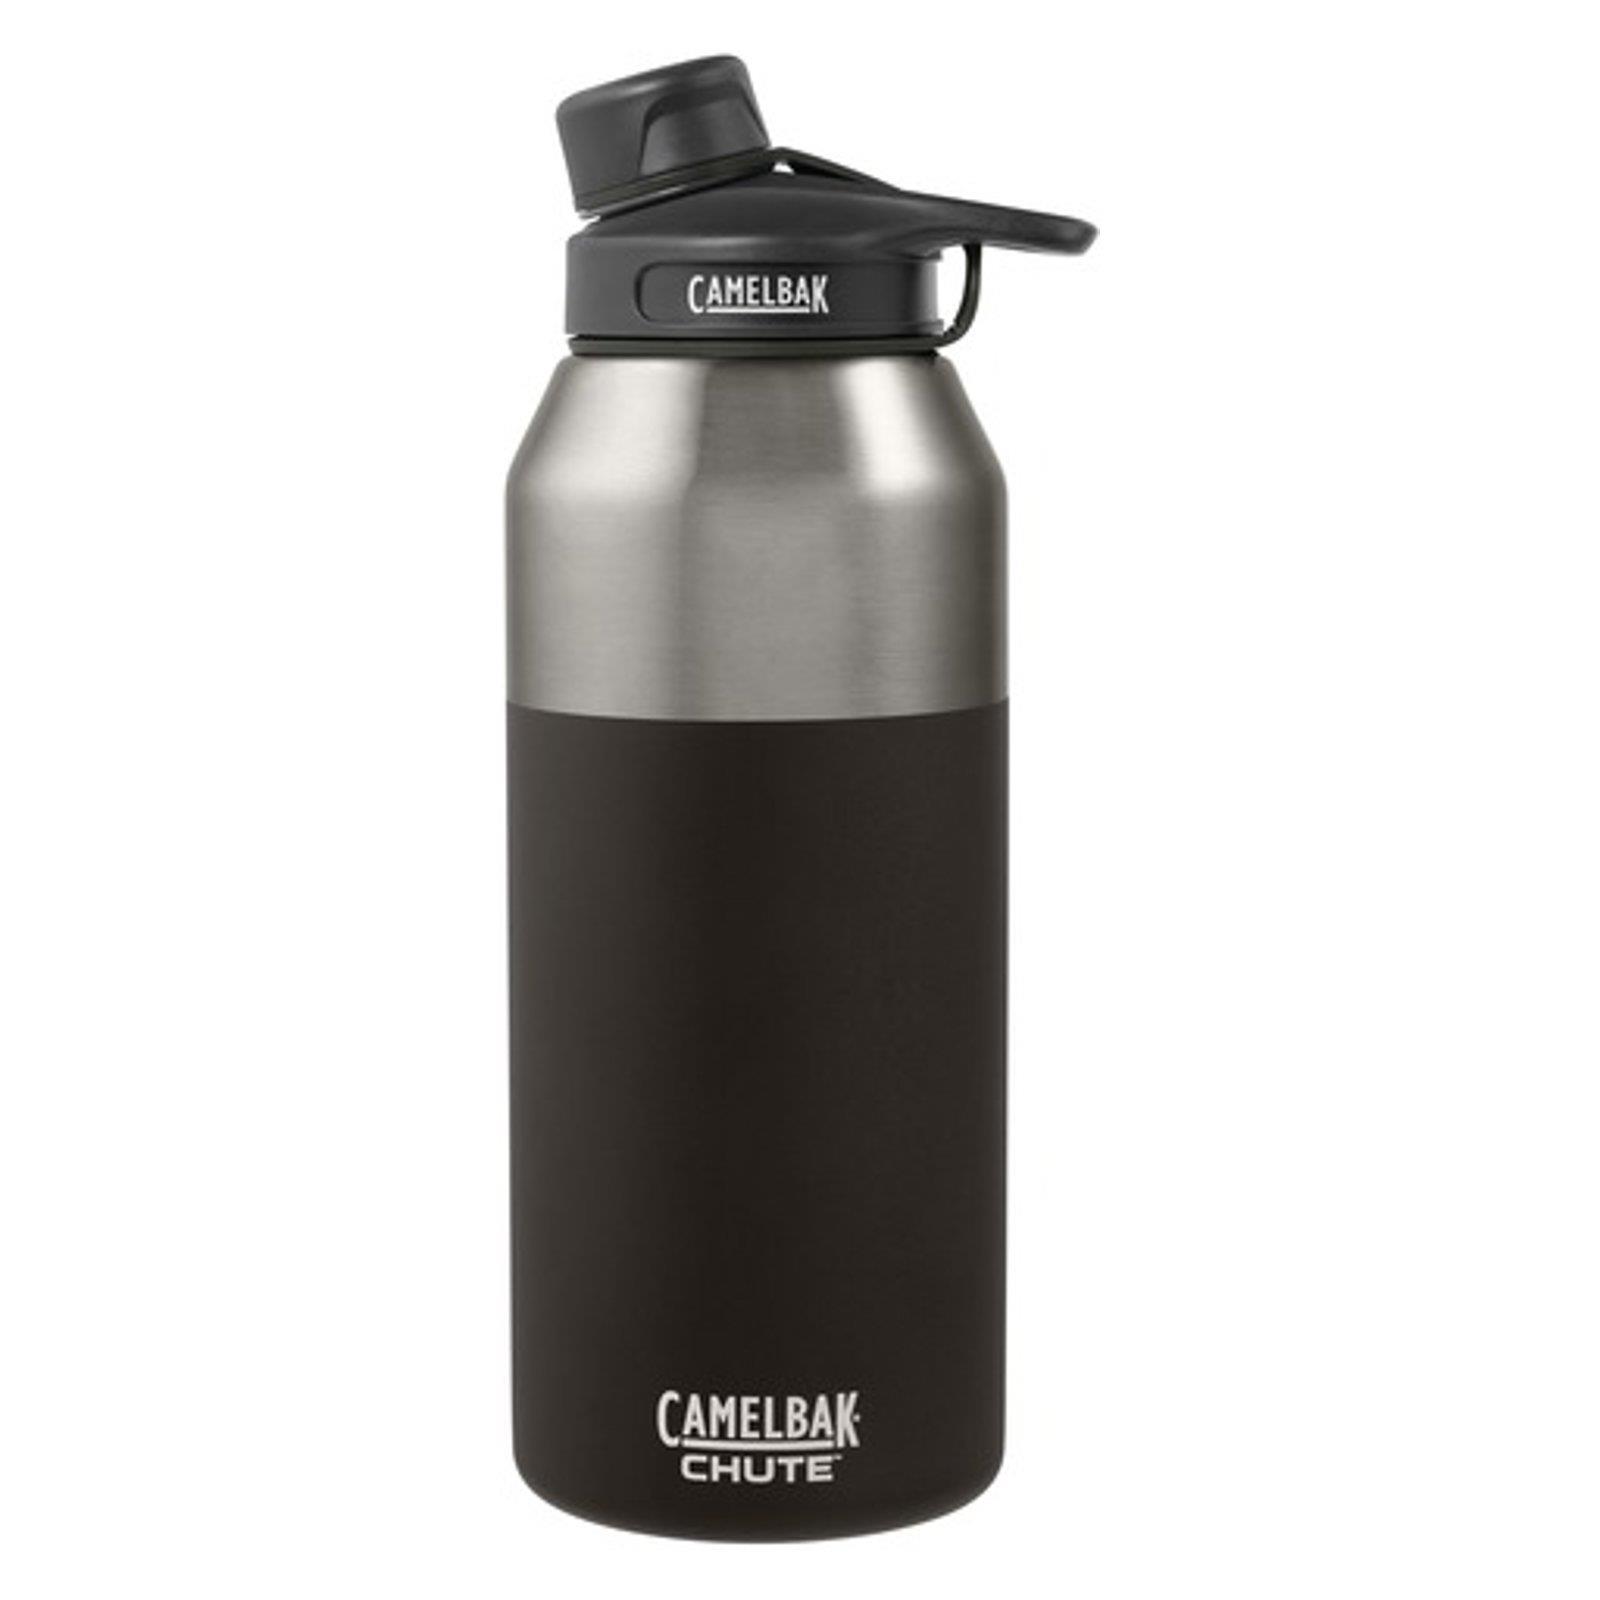 Camelbak-Trink-Isolier-Flasche-Chute-Vacuum-Thermo-Becher-Kanne-Outdoor Indexbild 13